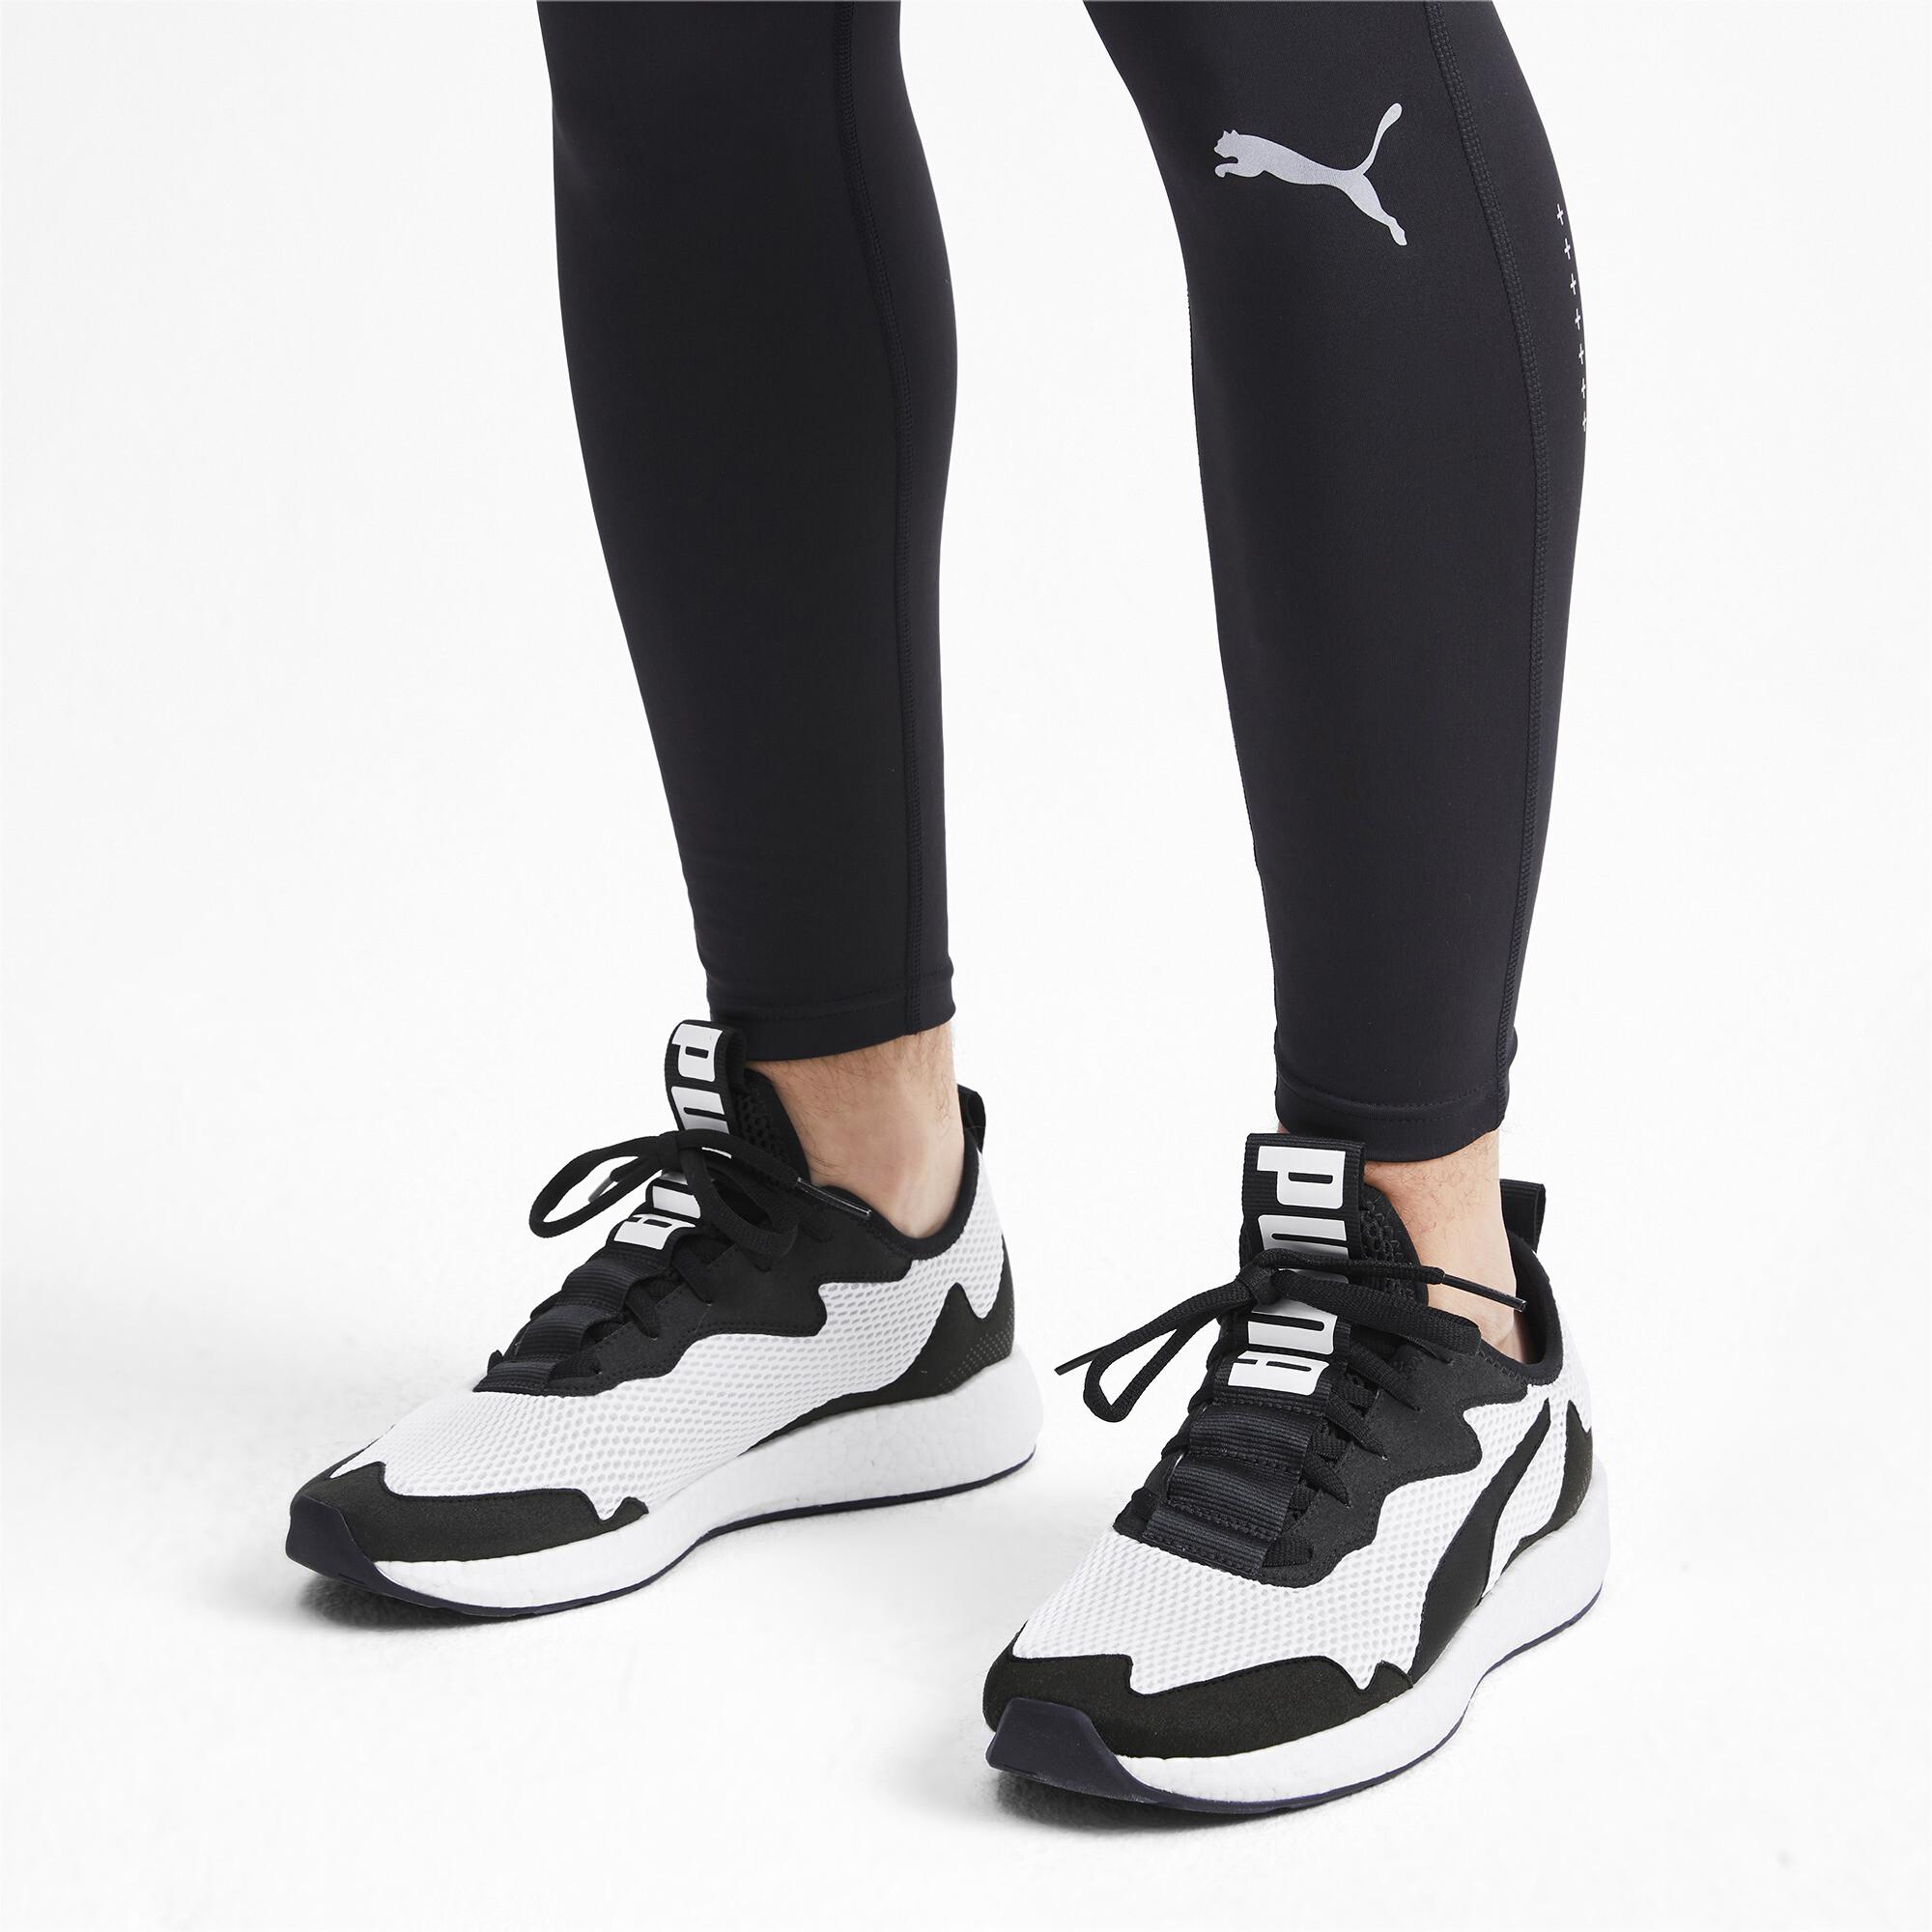 PUMA-NRGY-Neko-Skim-Men-s-Running-Shoes-Men-Shoe-Running thumbnail 20